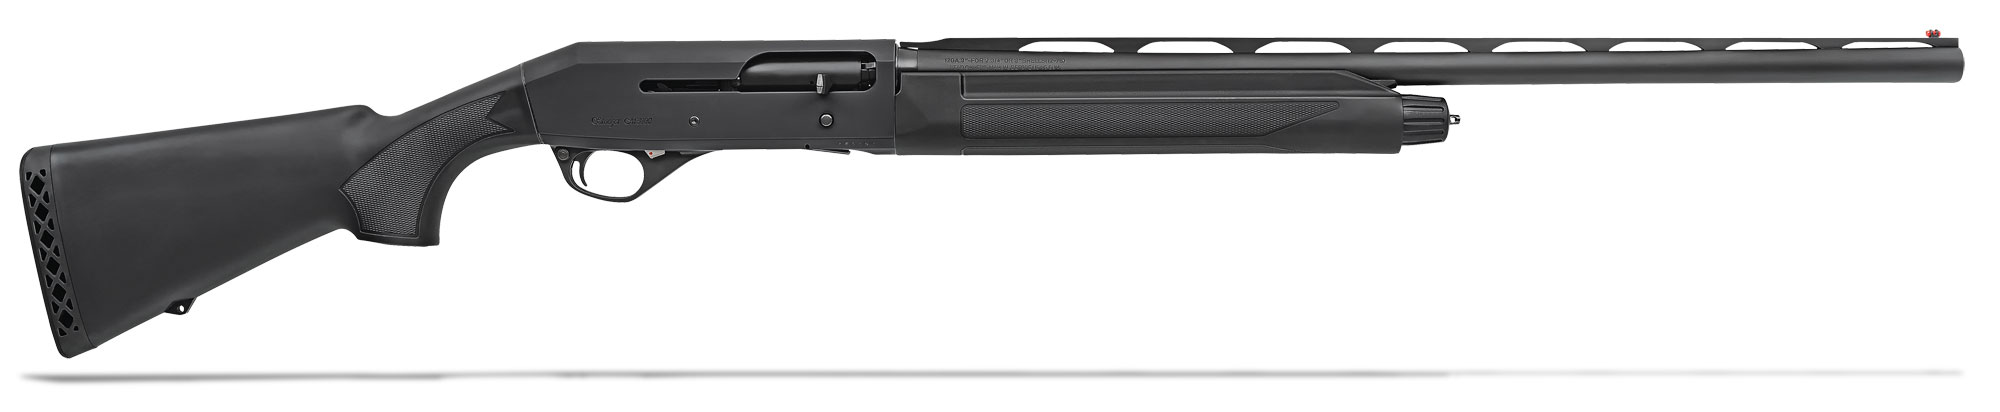 Stoeger M3000 Compact 12ga 26